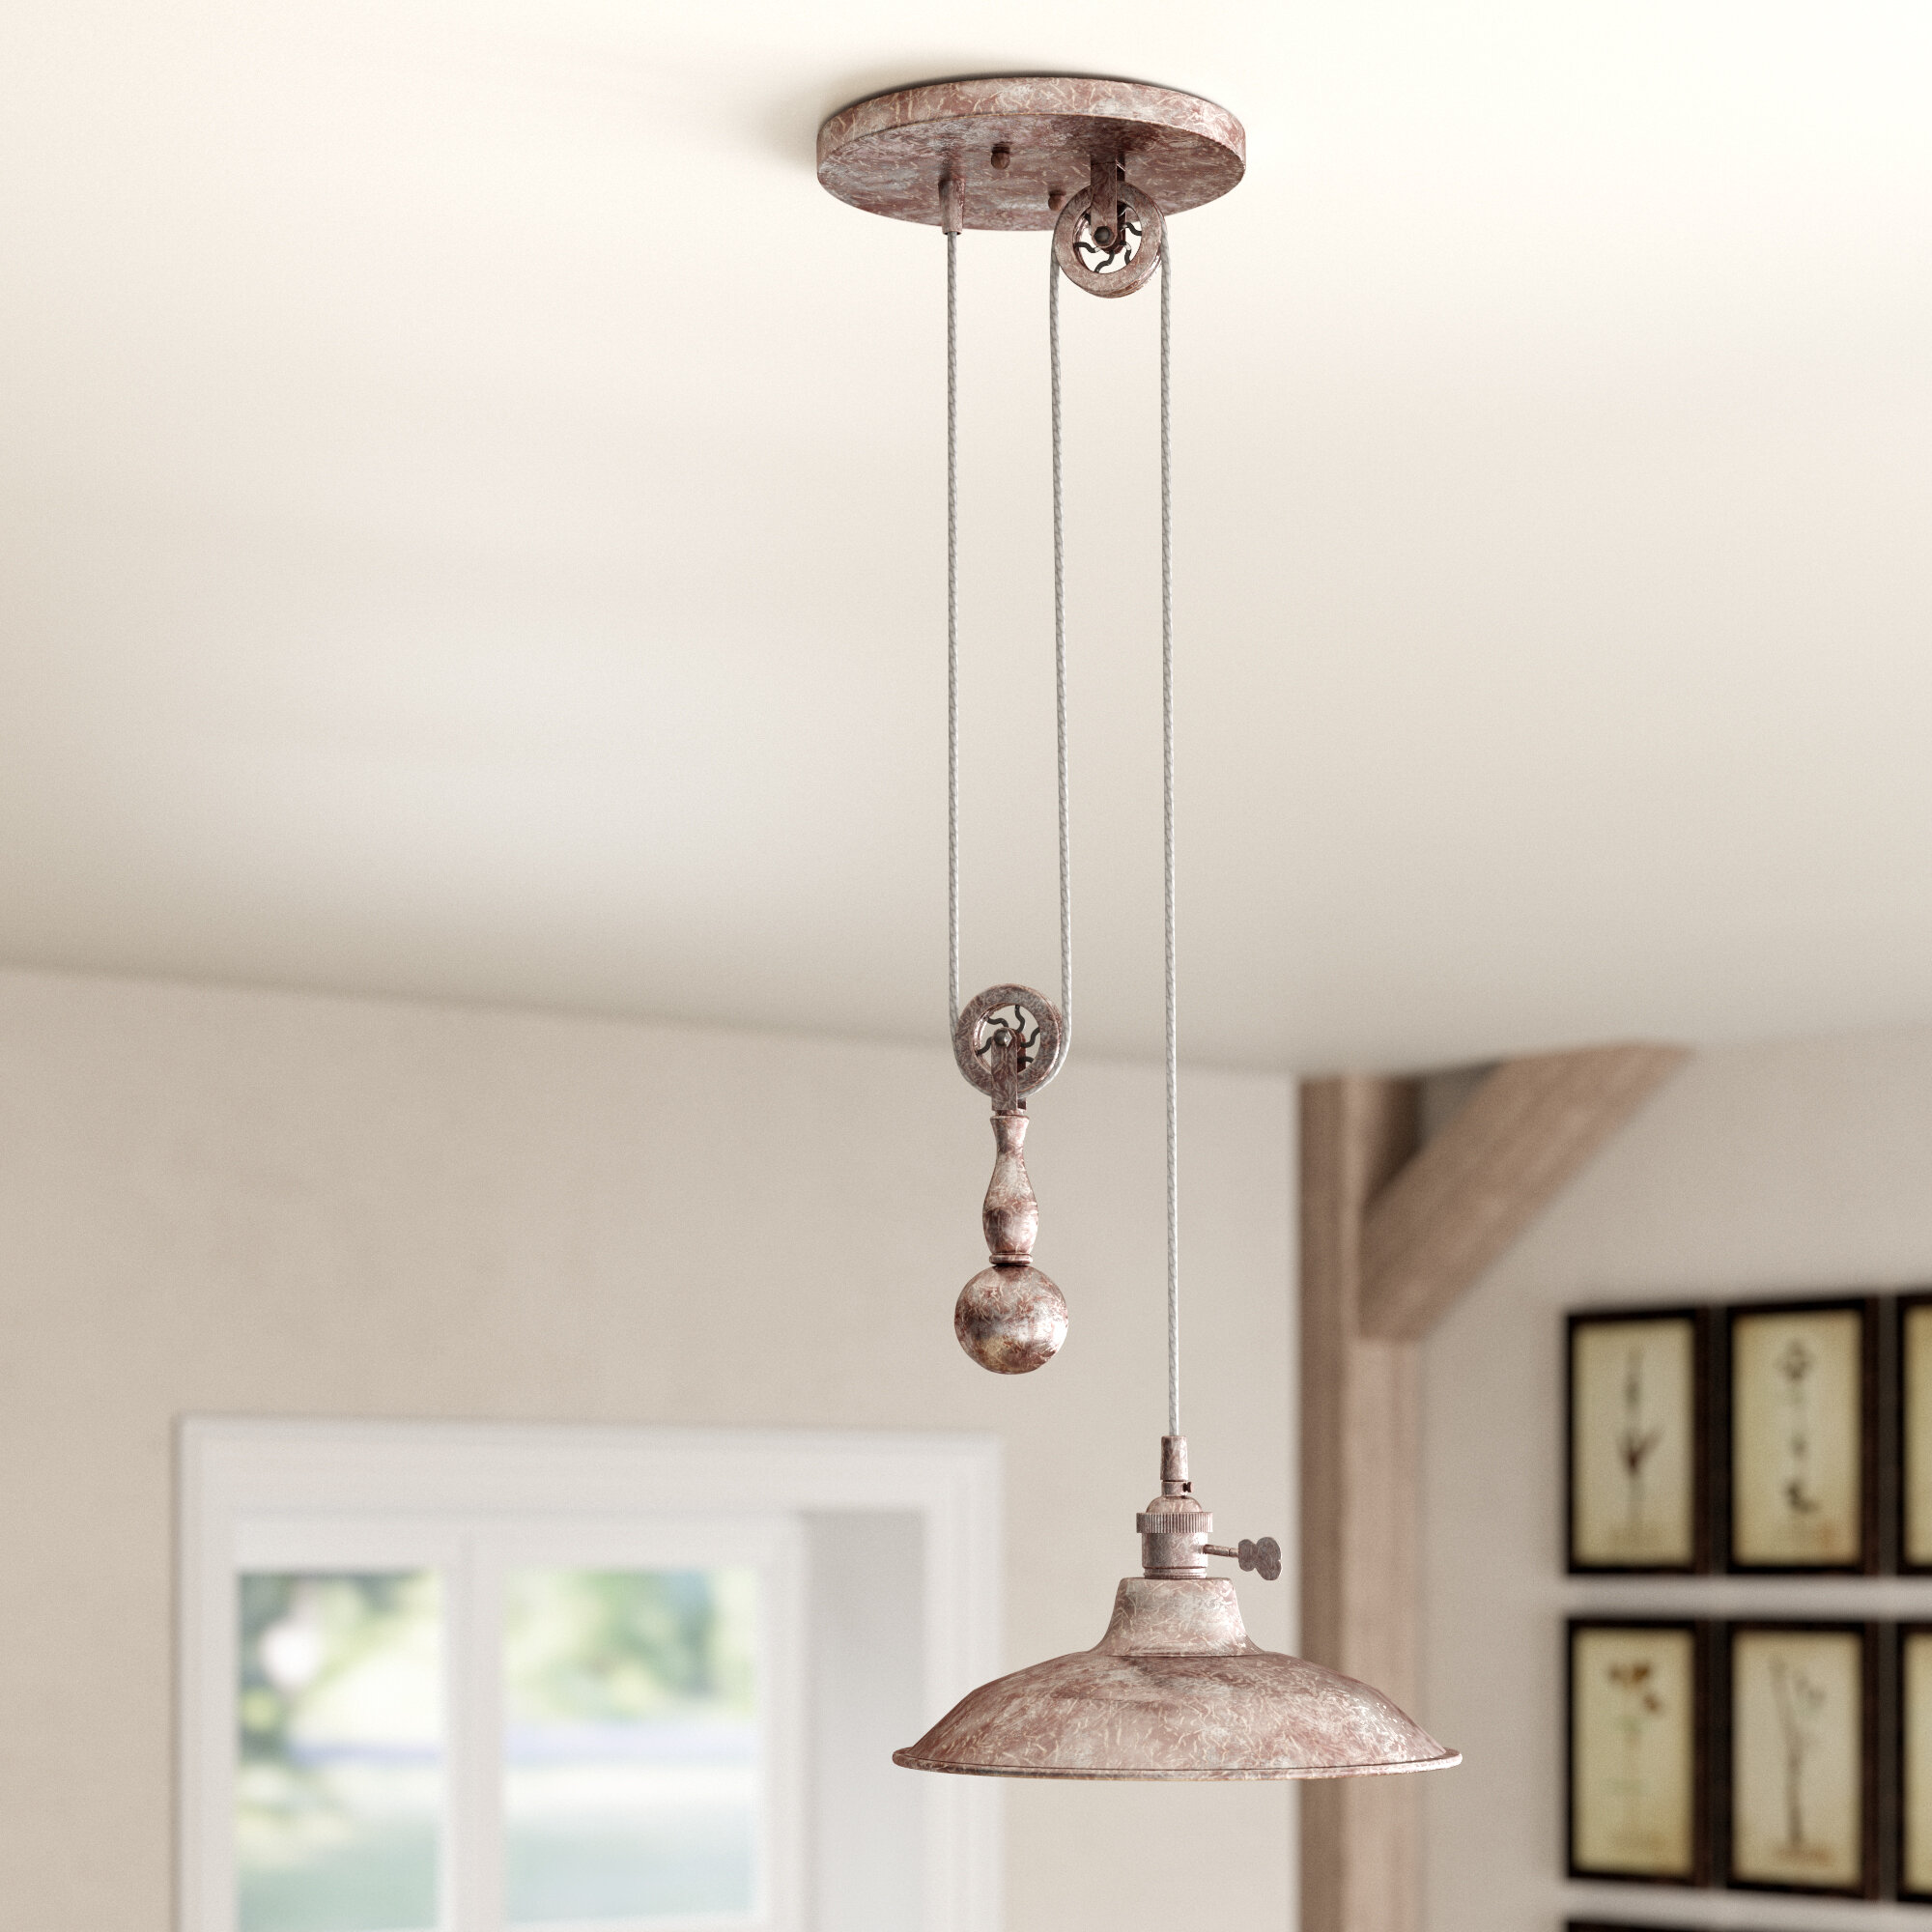 Rolland 1 Light Single Dome Pendant Reviews Birch Lane